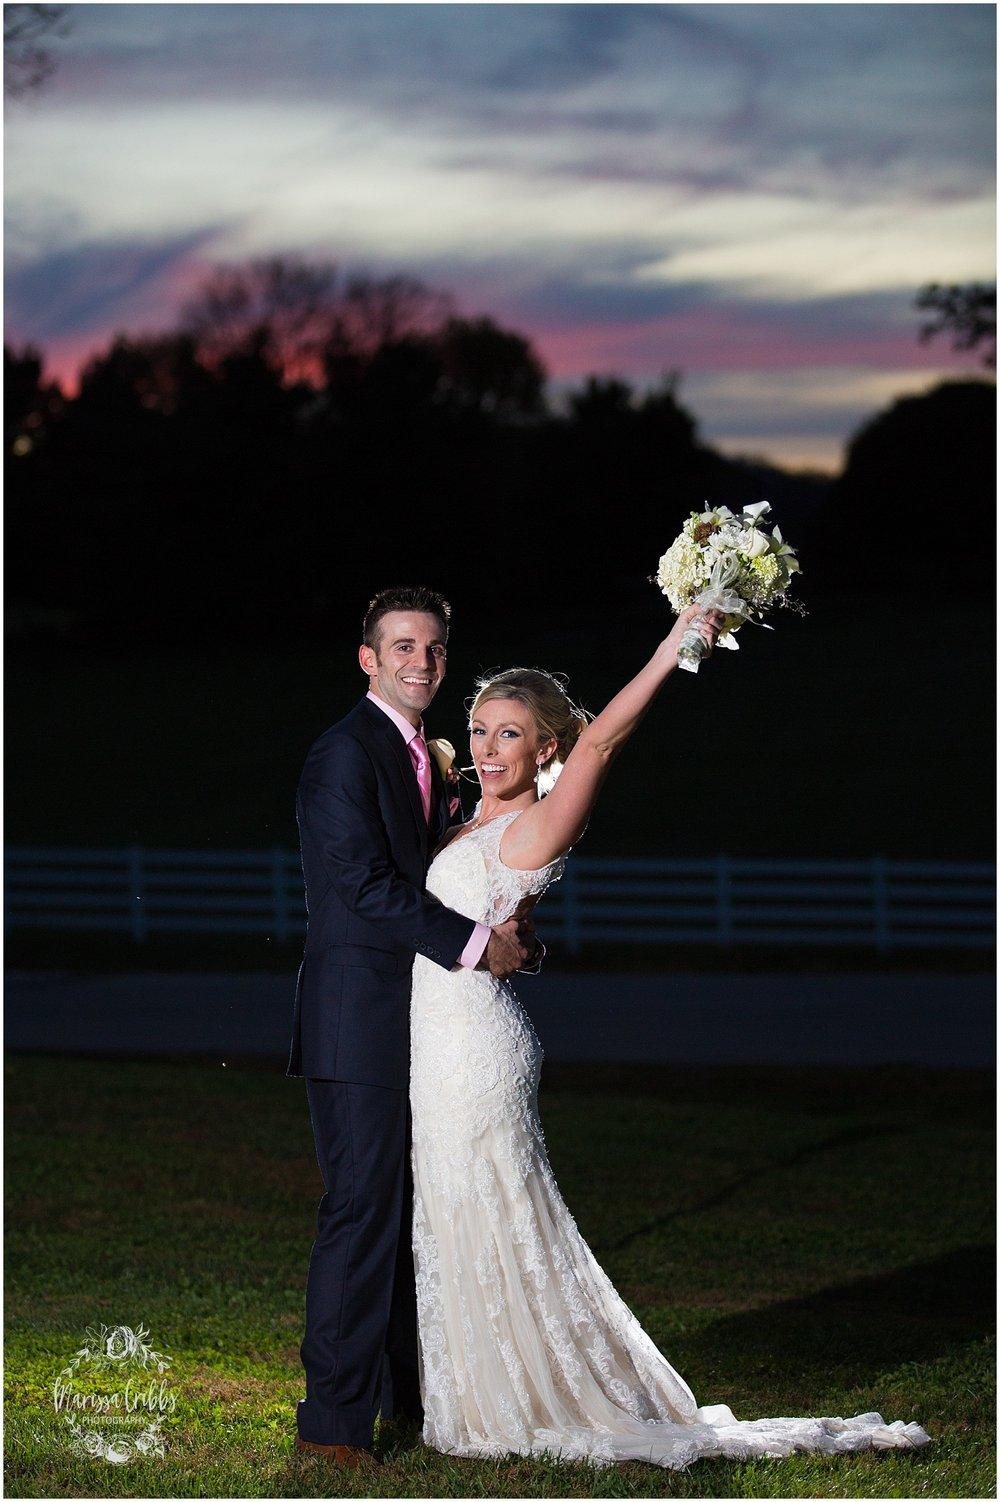 Alex & Amie | Eighteen Ninety Event Space | Marissa Cribbs Photography | Kansas City Perfect Wedding Guide_1369.jpg